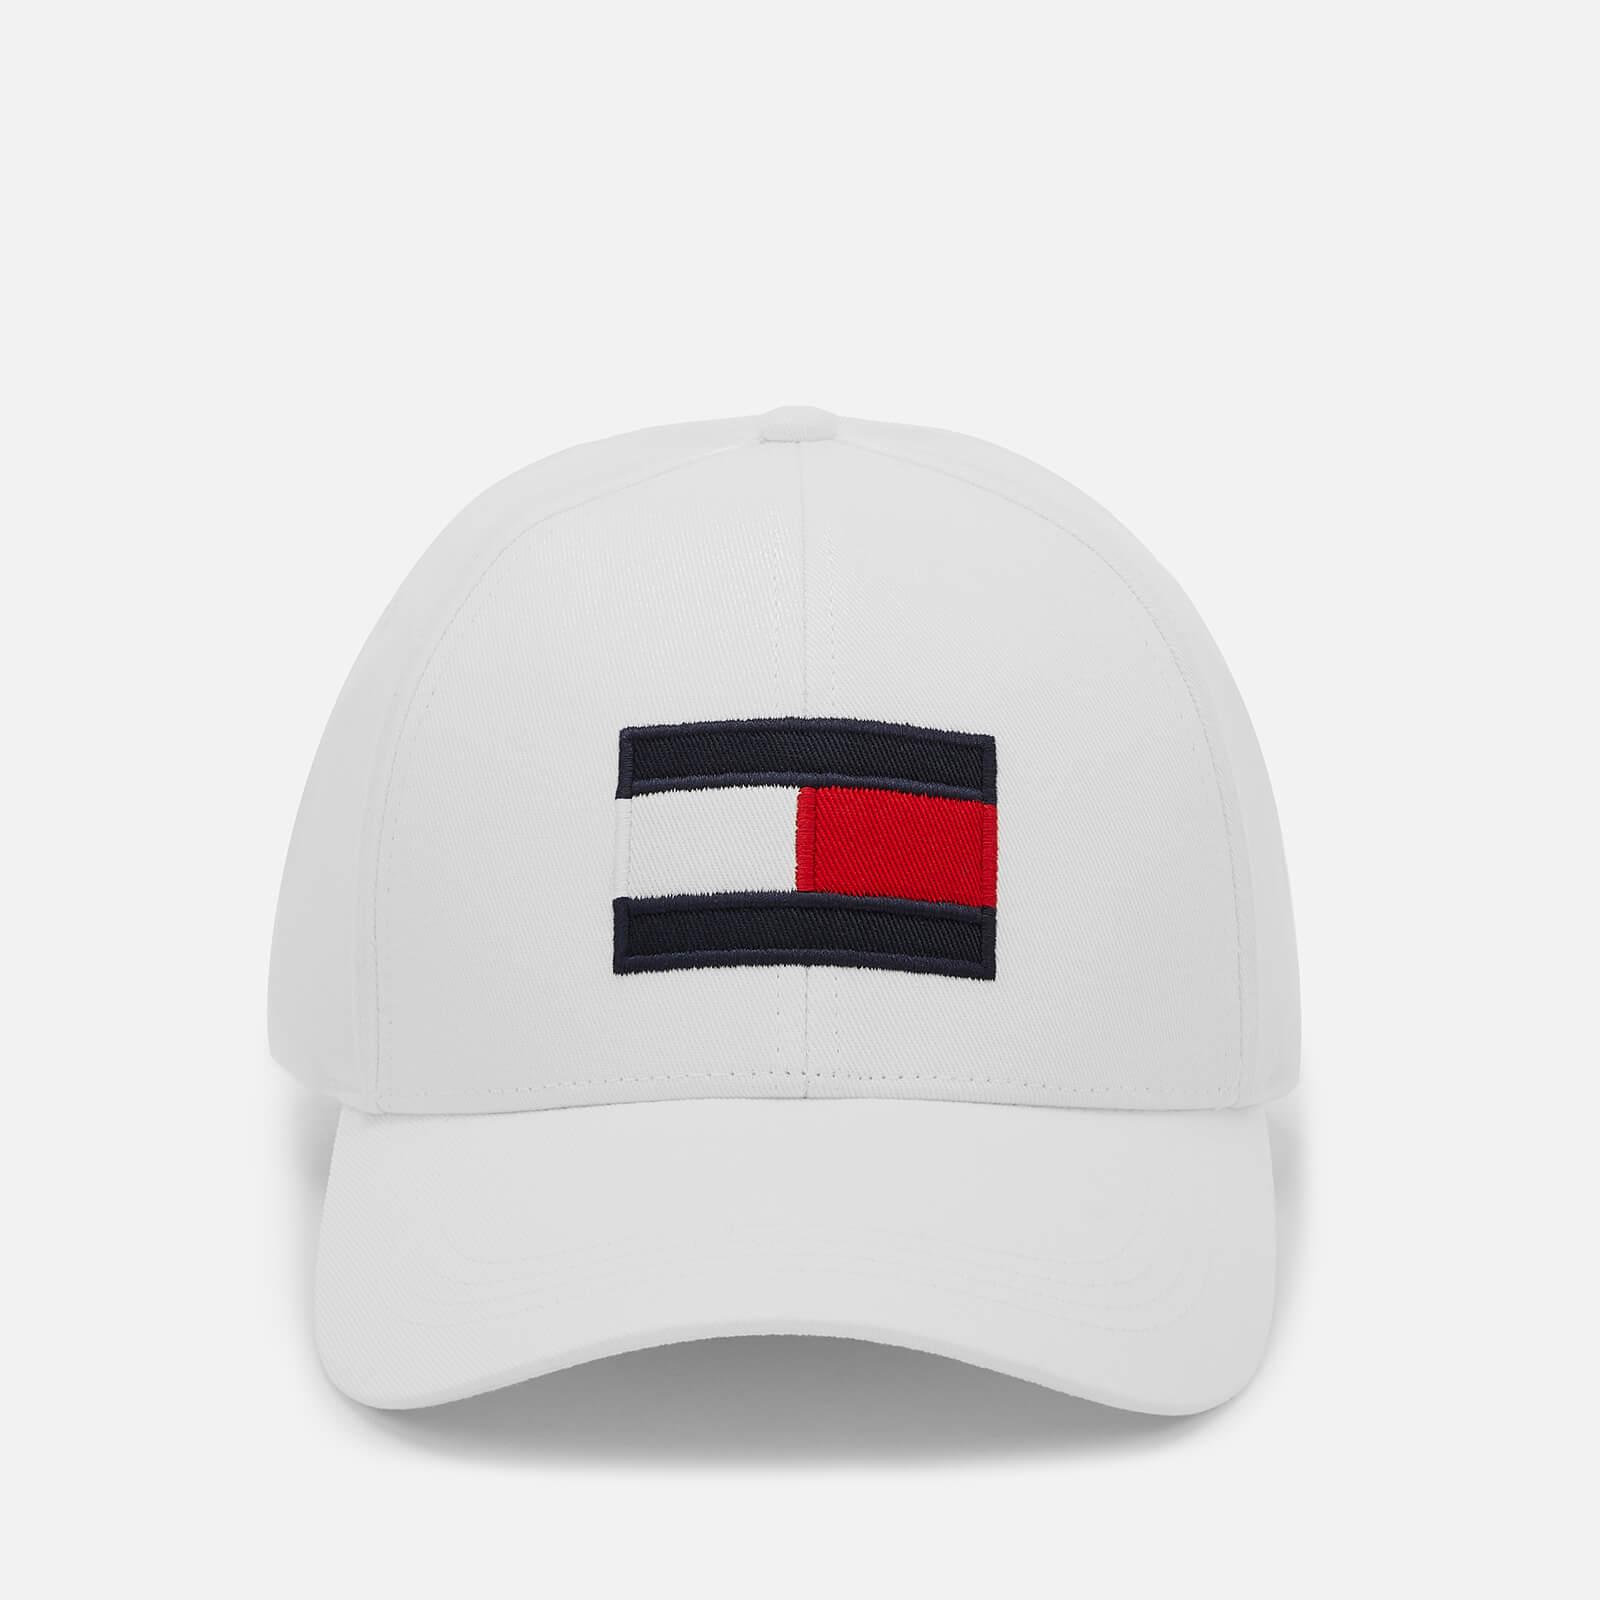 b5b02440738dc Tommy Hilfiger Men s Large Flag Baseball Cap - Bright White Mens  Accessories